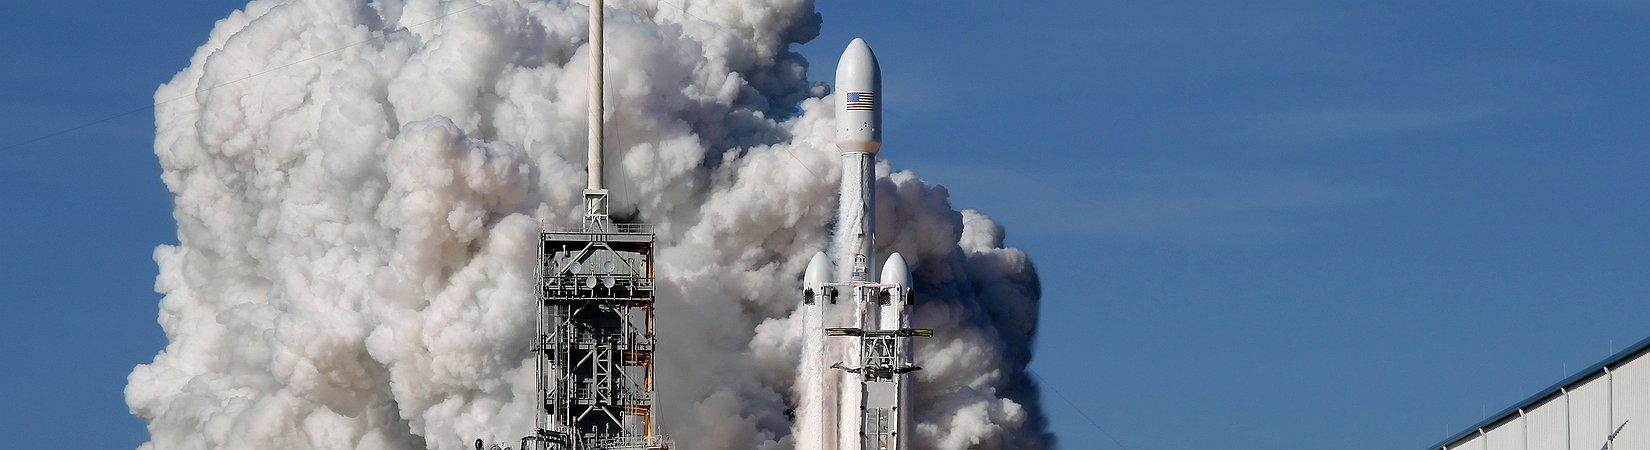 SpaceX успешно запустил Falcon Heavy